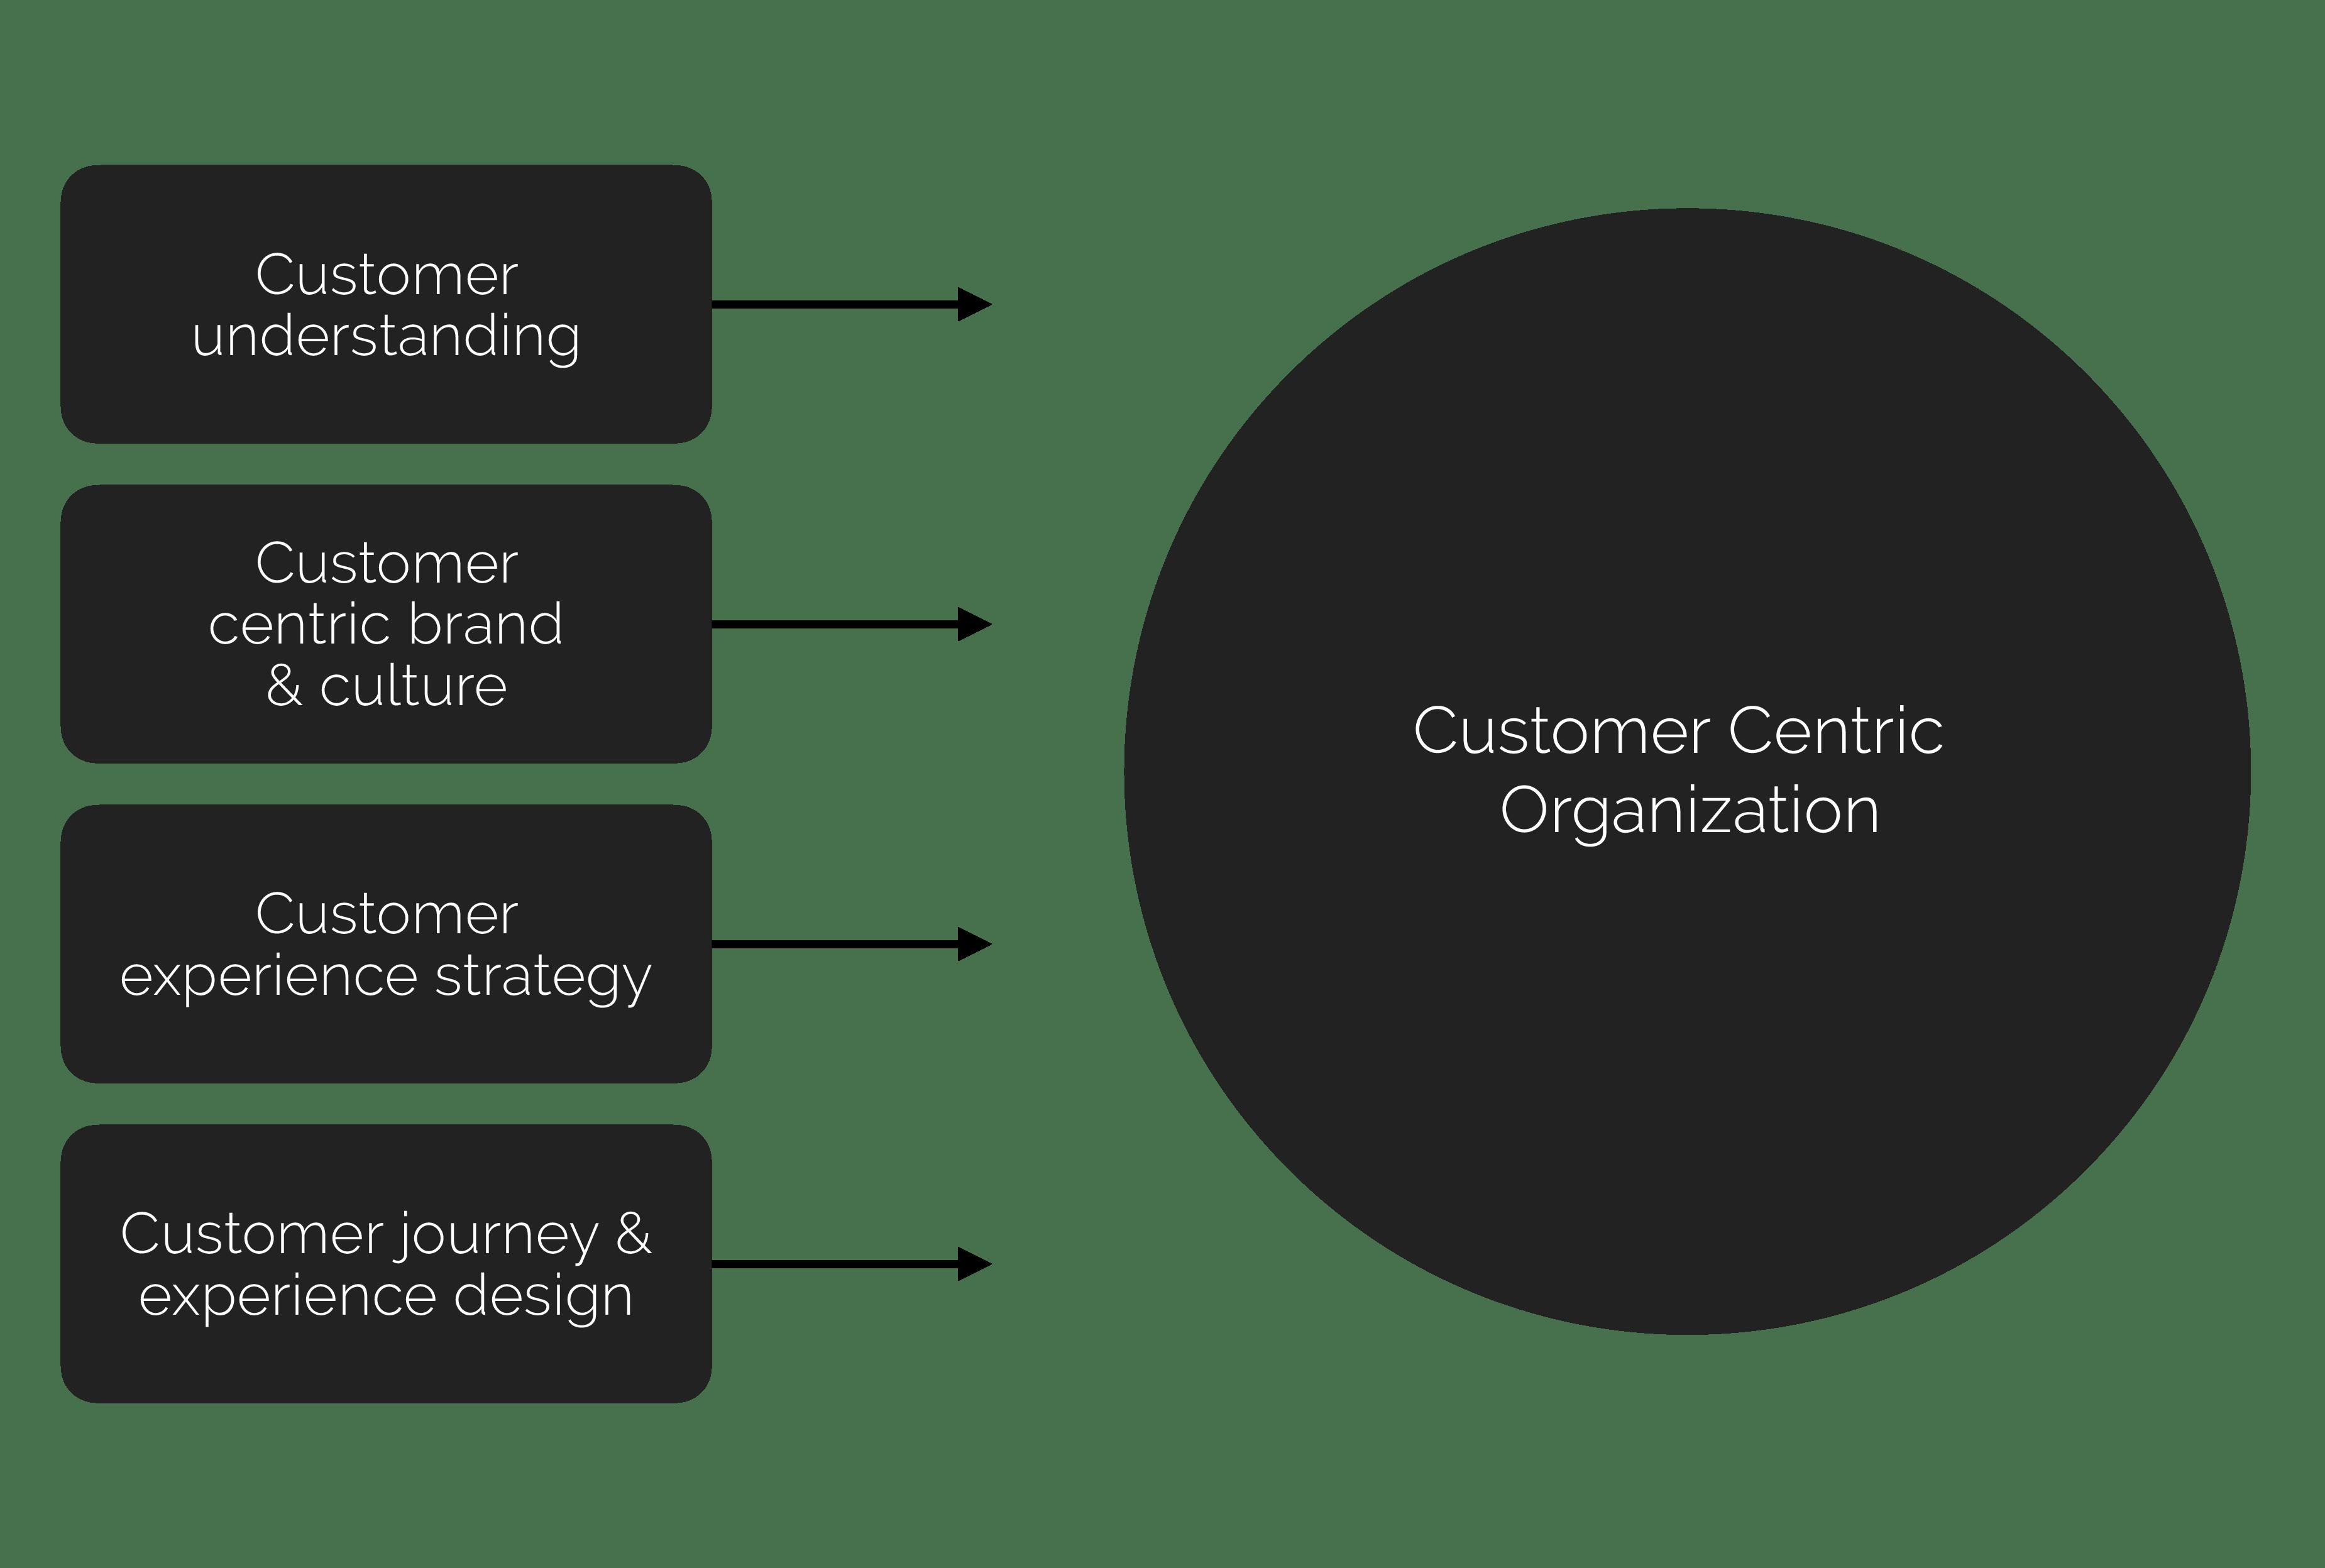 Creating a customer centric organization for LYNX online broker